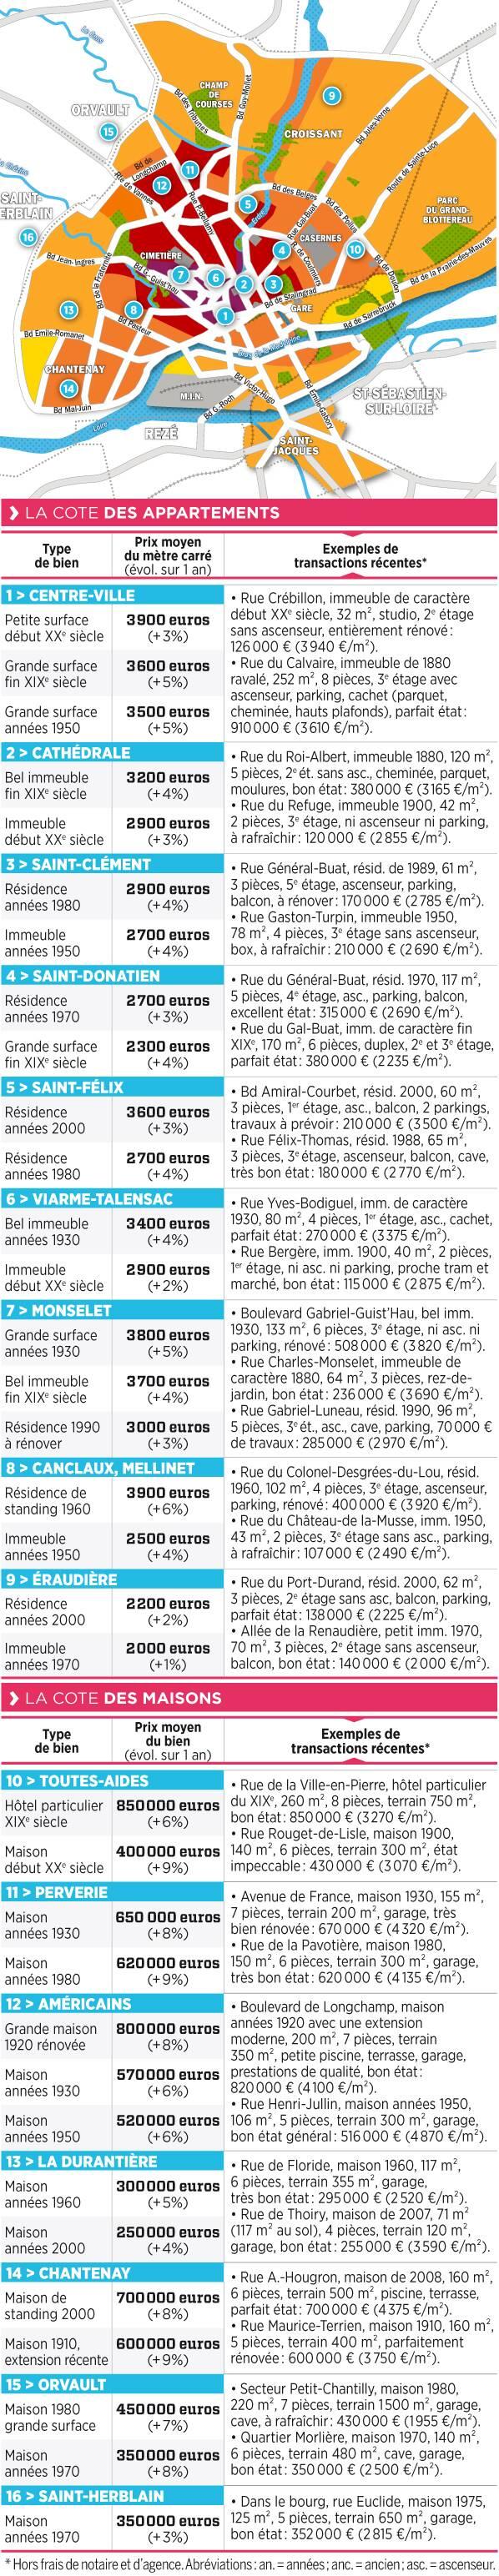 carte de prix immobilier à nantes